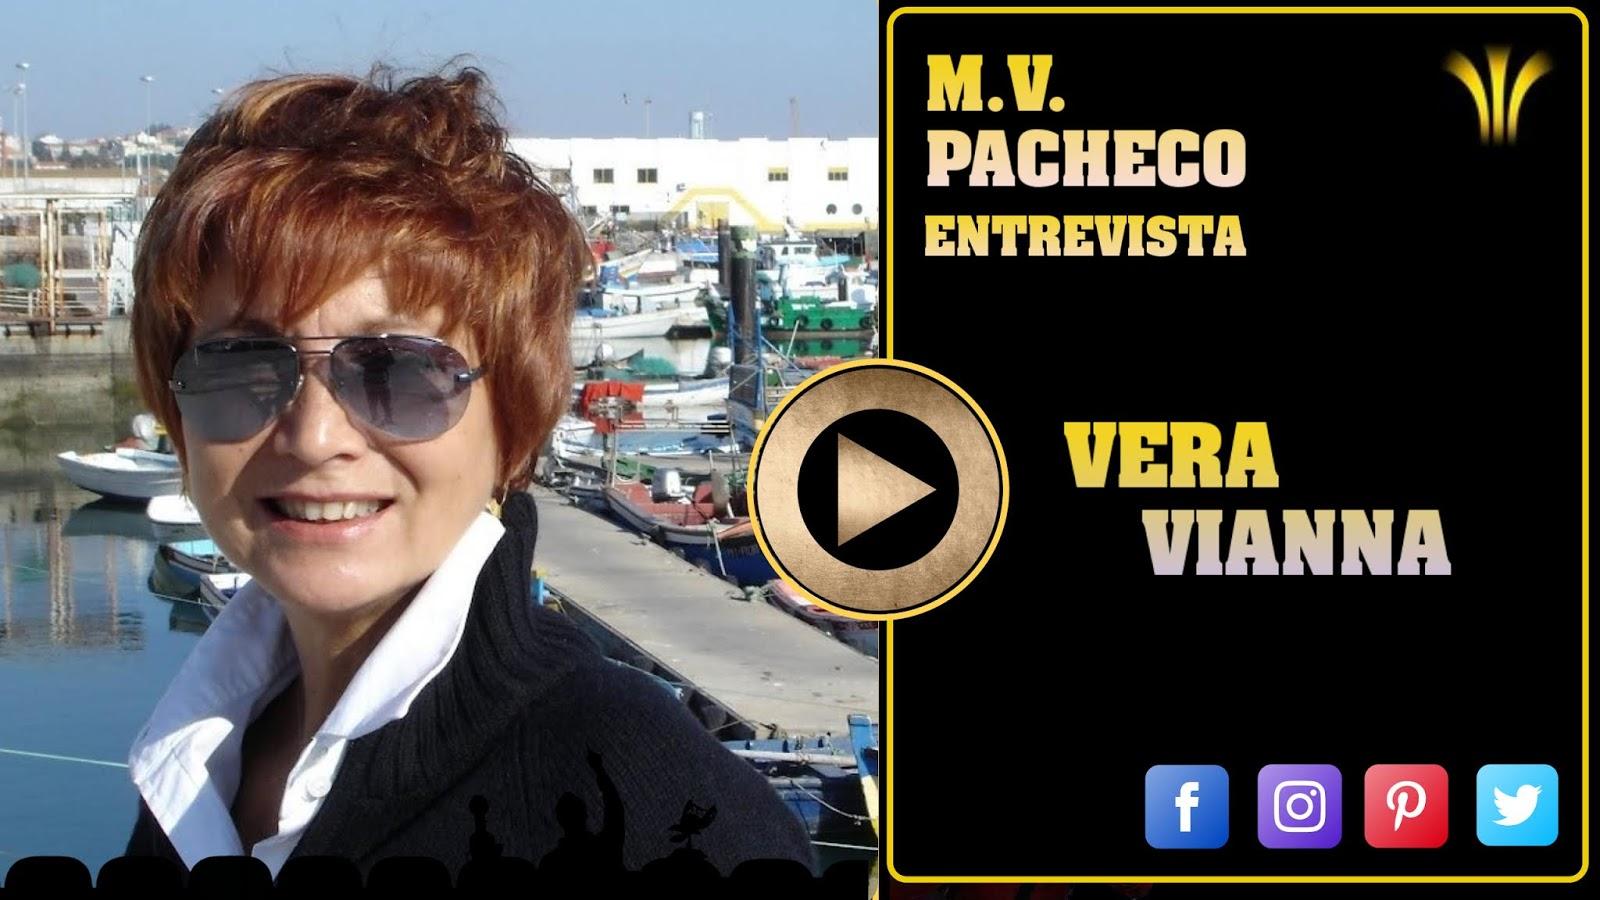 vera-vianna-entrevista